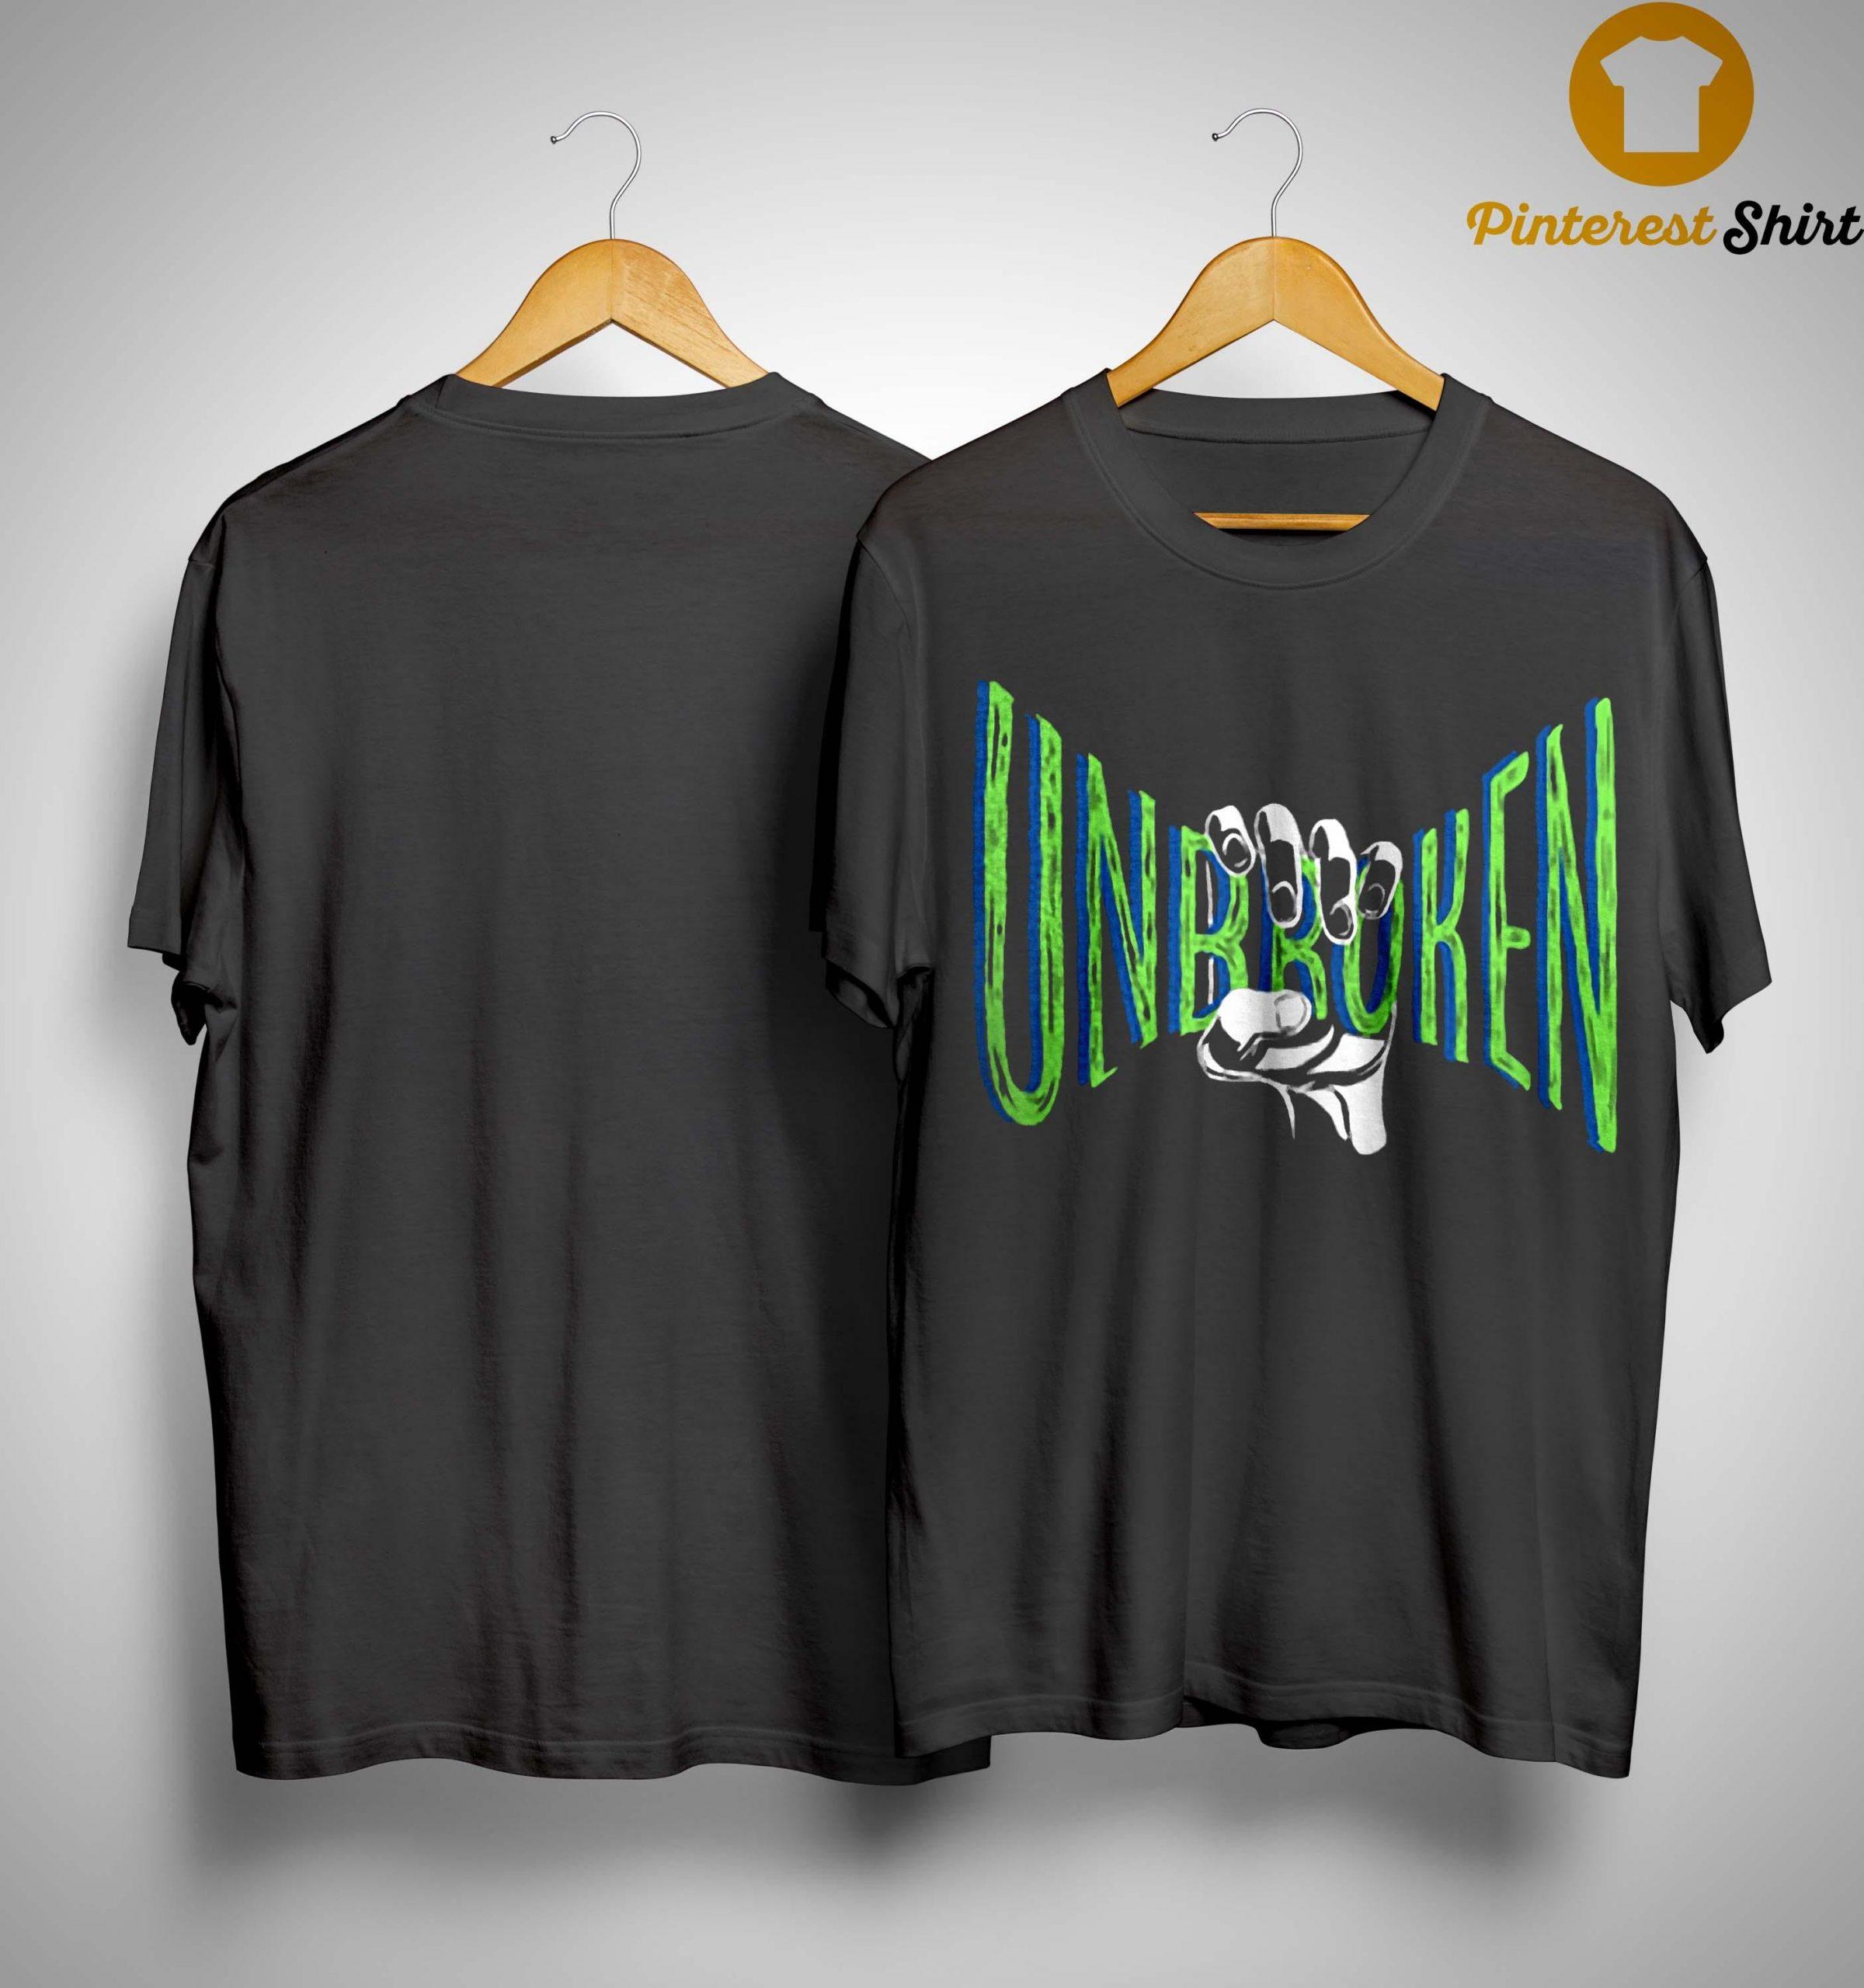 Timothy Omundson Unbroken Shirt